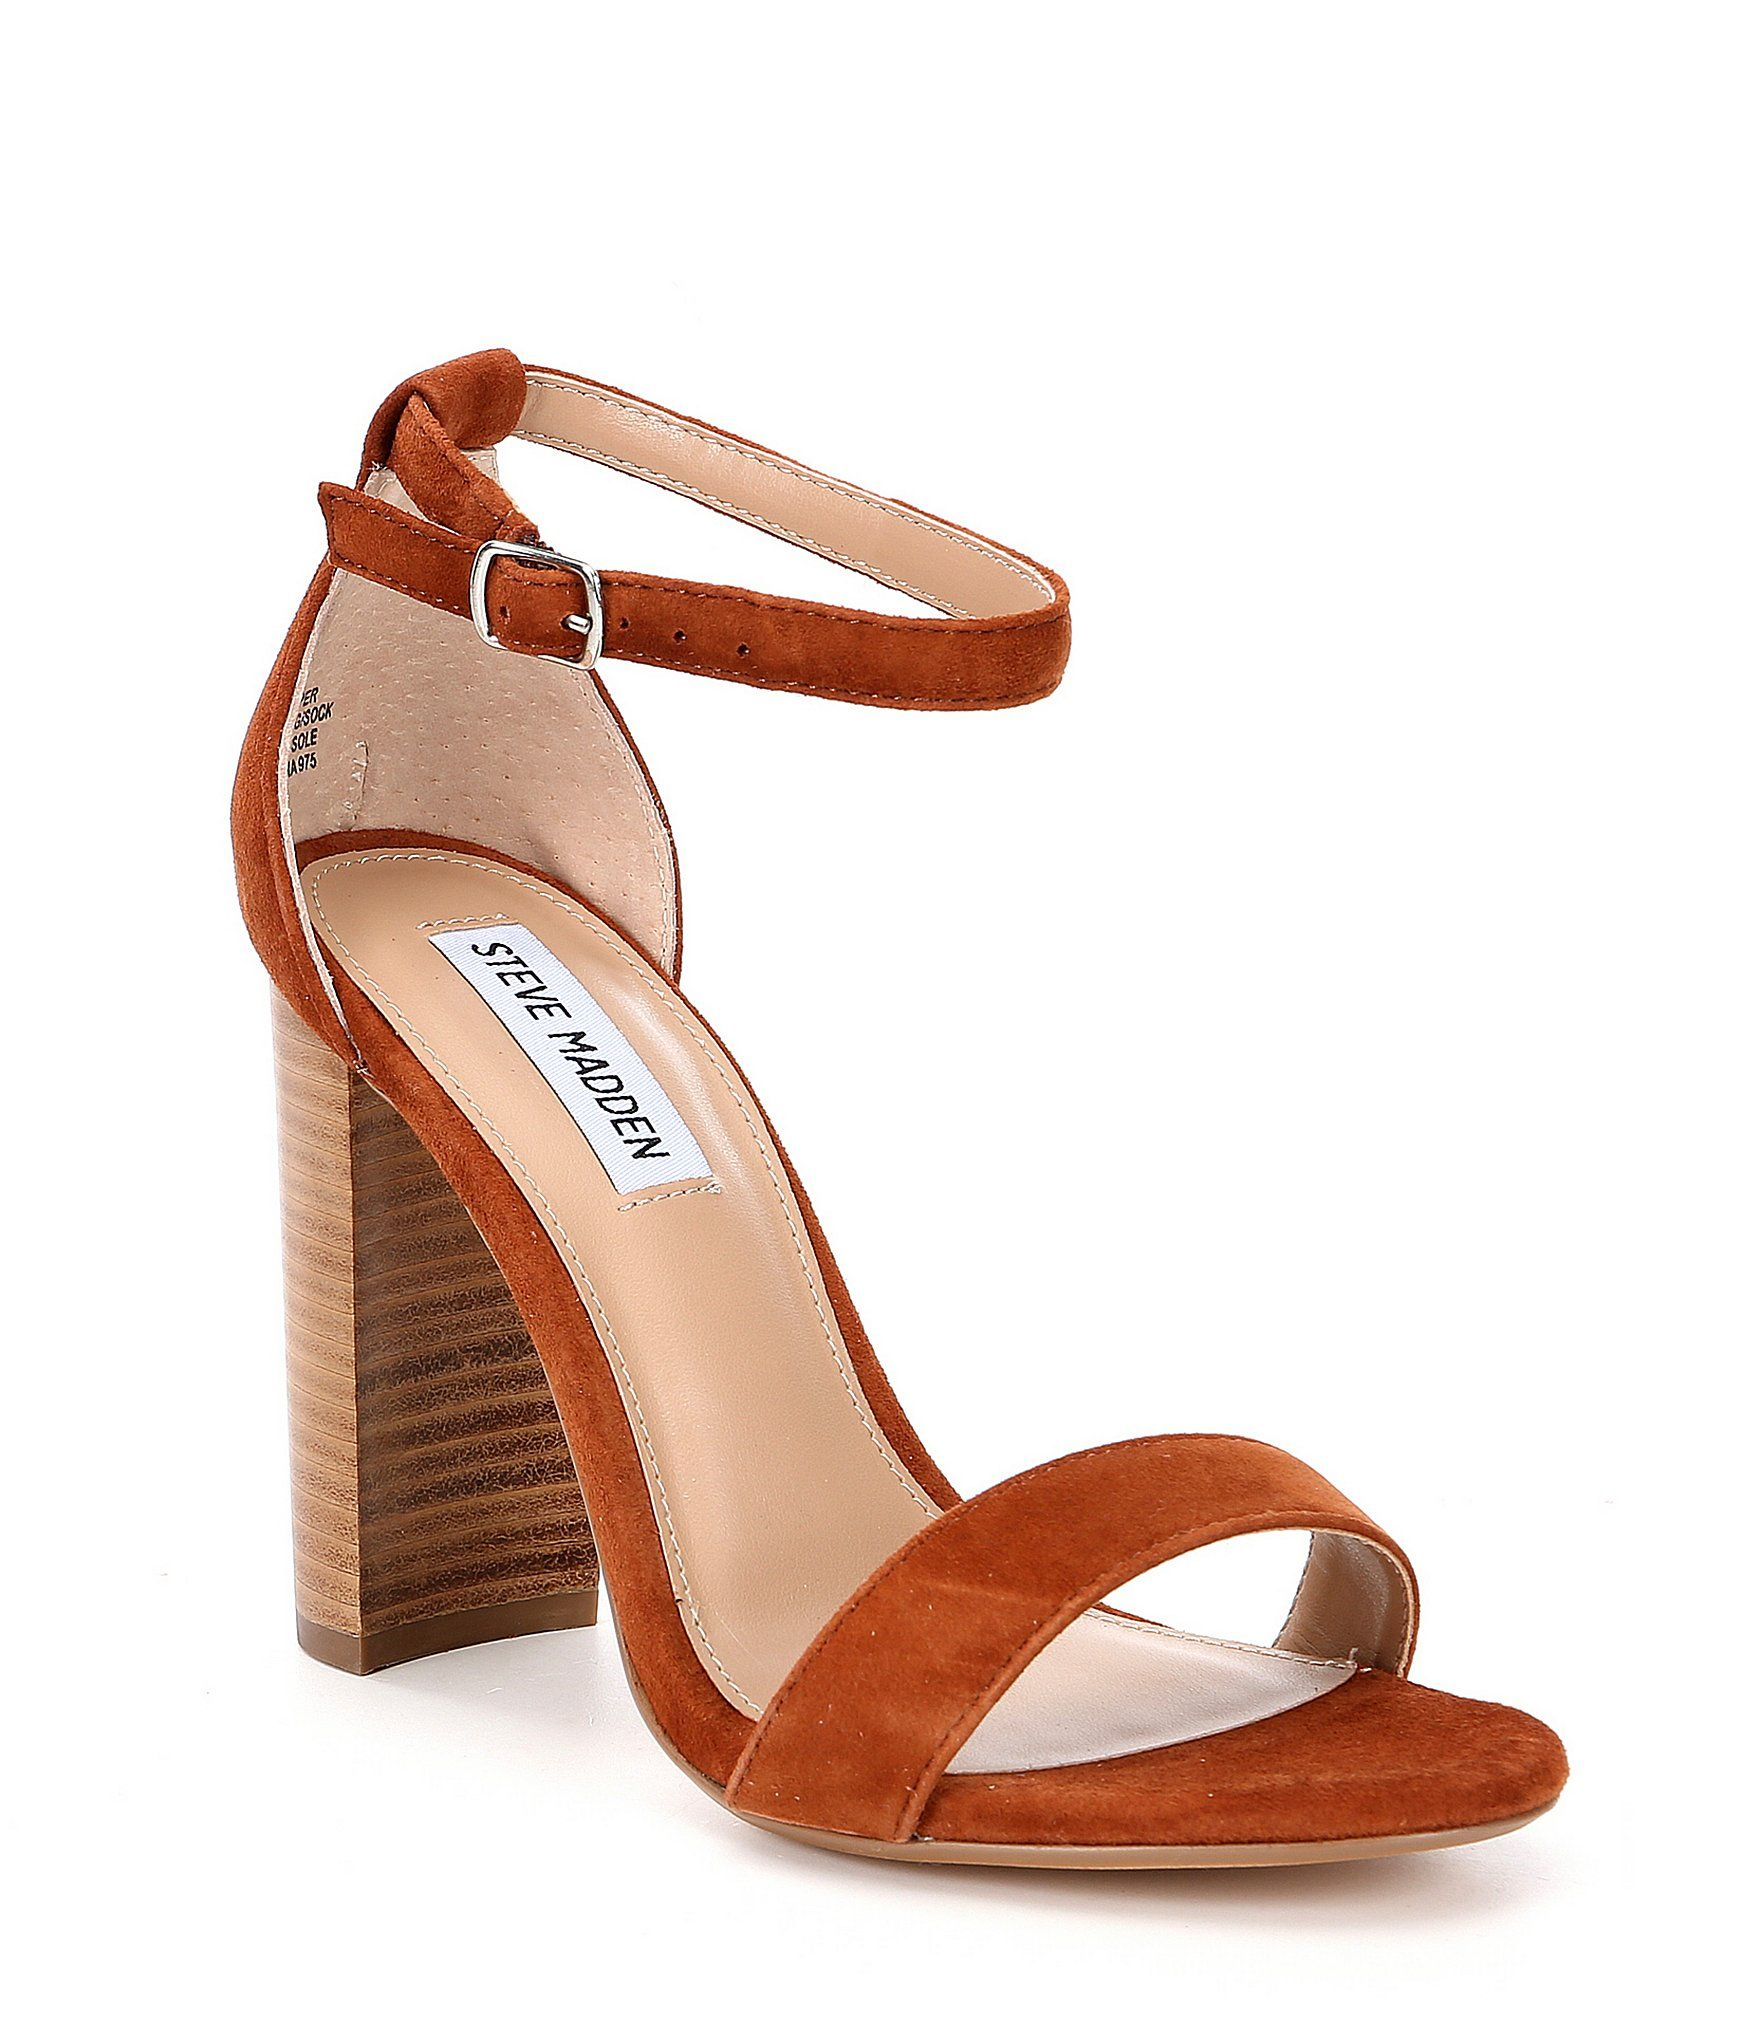 fea9c8e884403 Shop for Steve Madden Carrson Suede Ankle Strap Block Heel Dress Sandals at  Dillards.com. Visit Dillards.com to find clothing